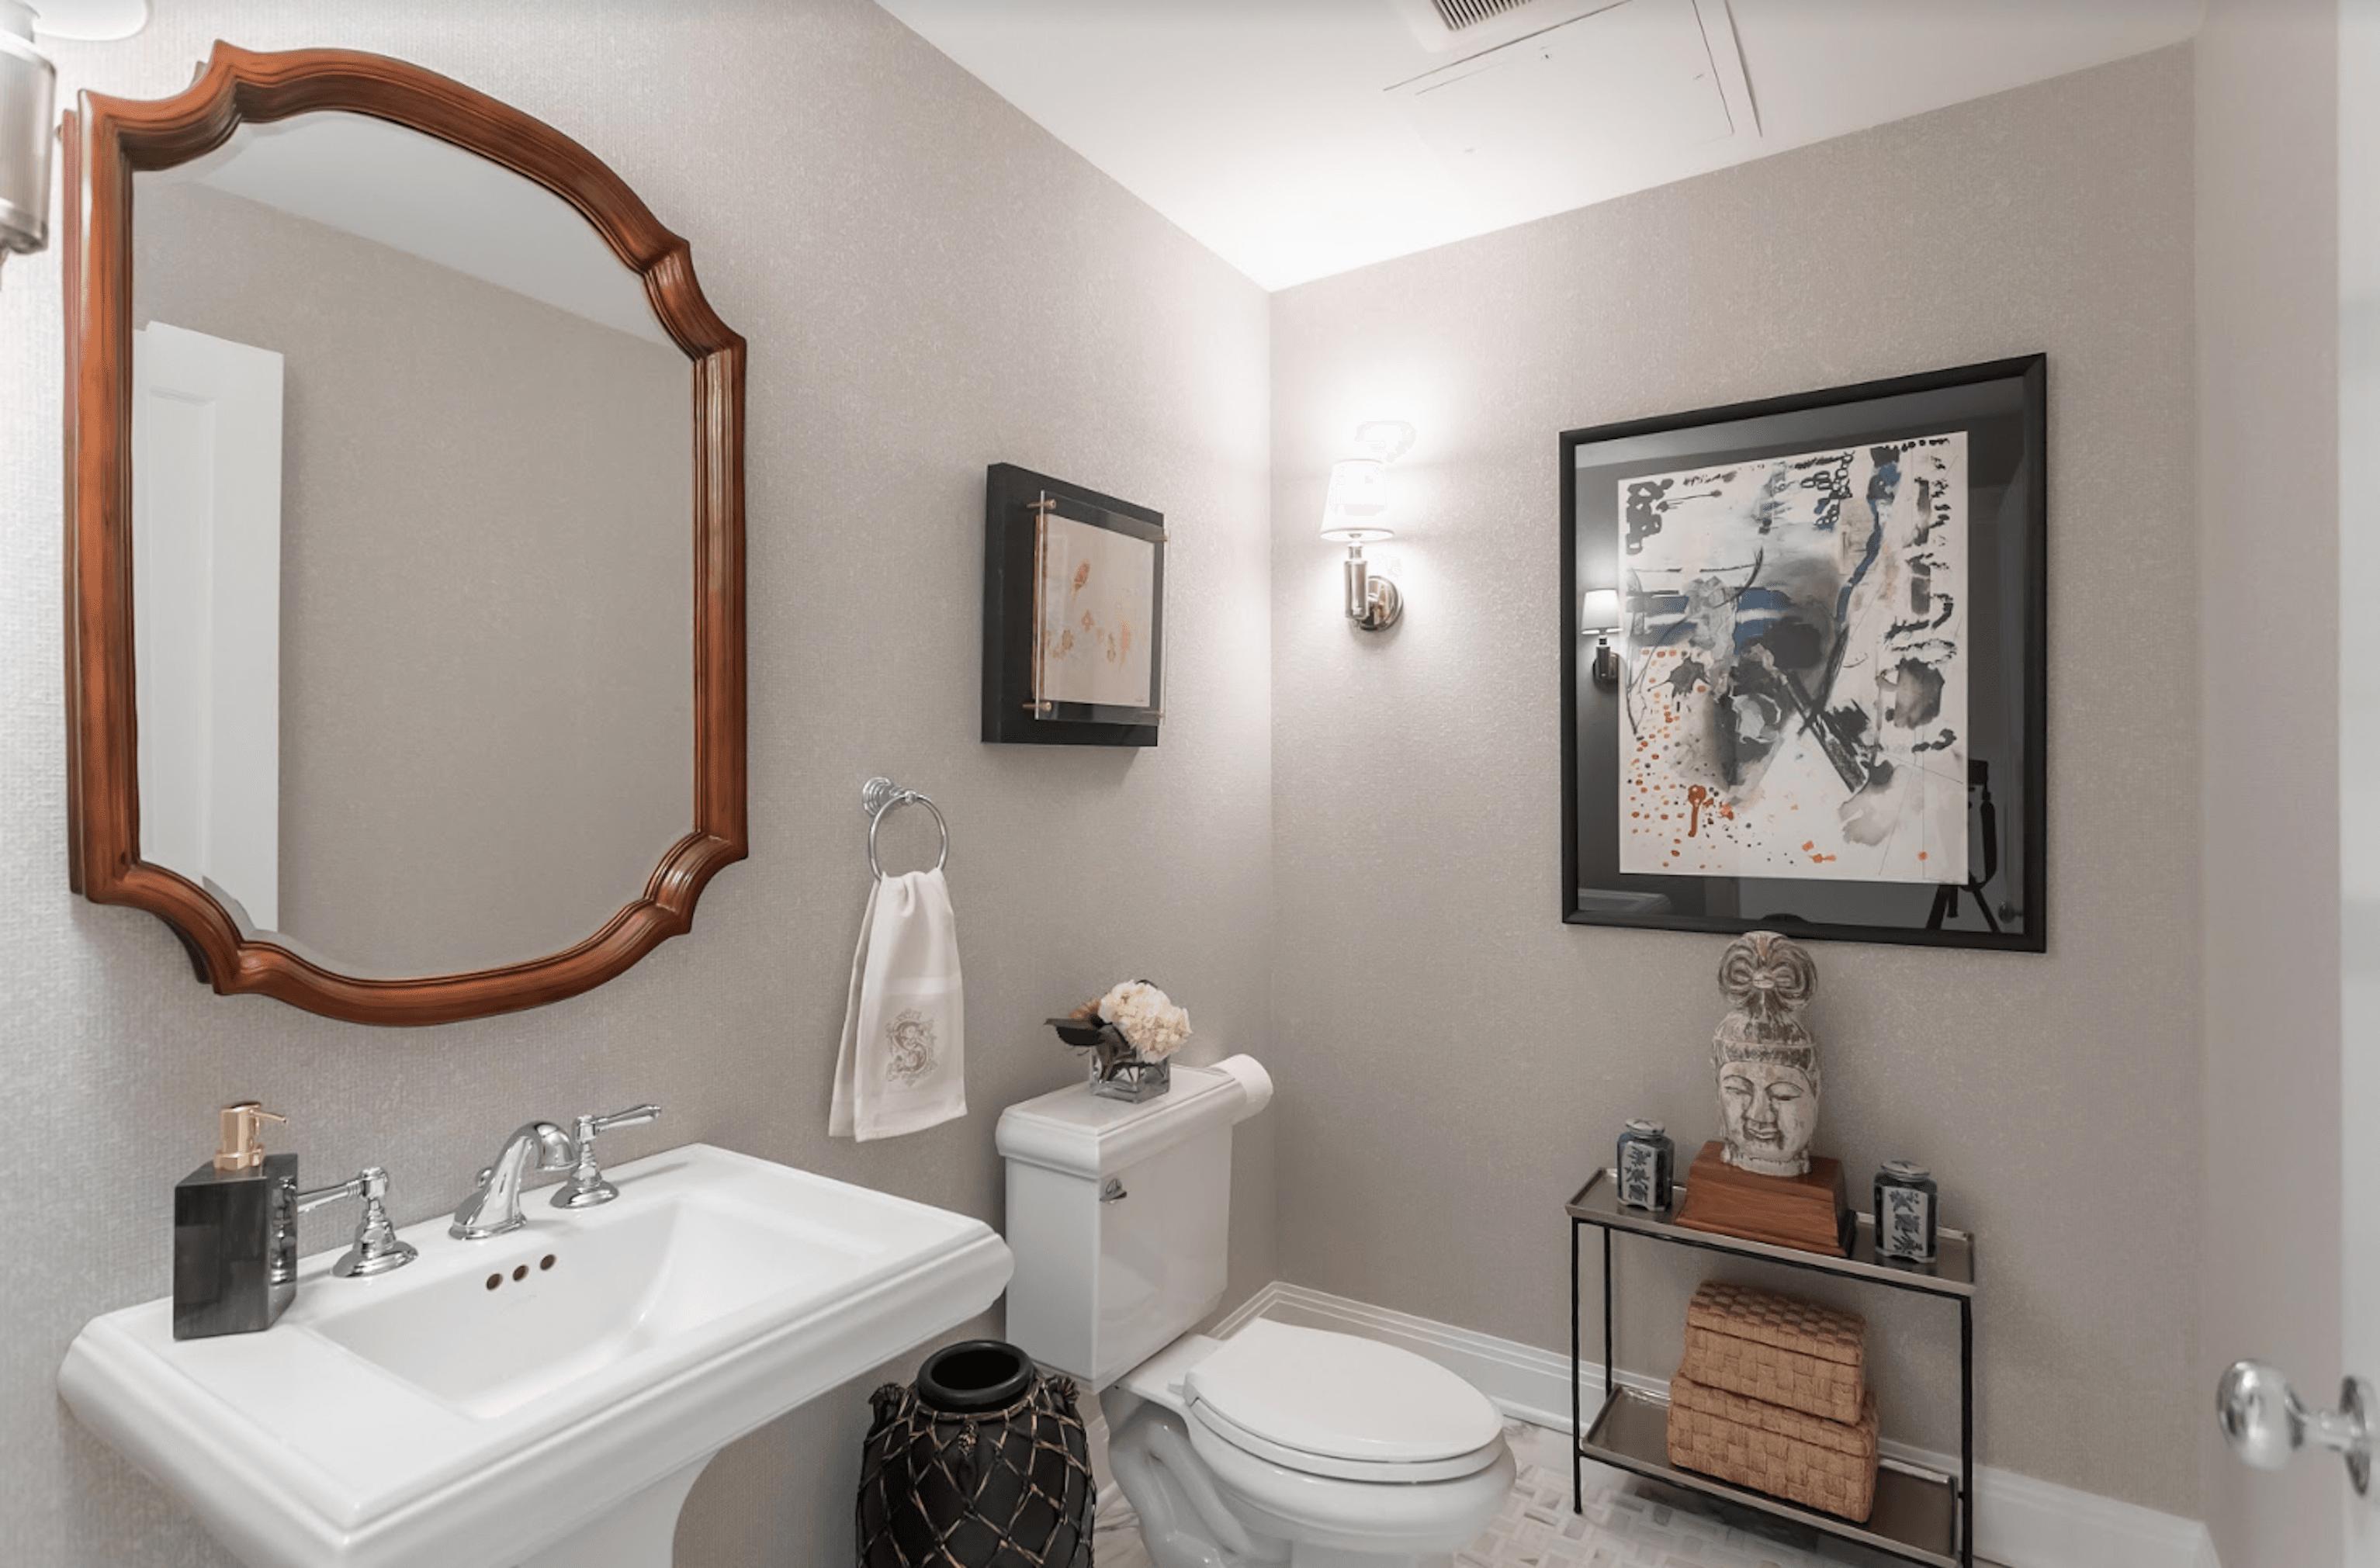 Interior Designer | Chicago Project | Matte & Gloss Interiors